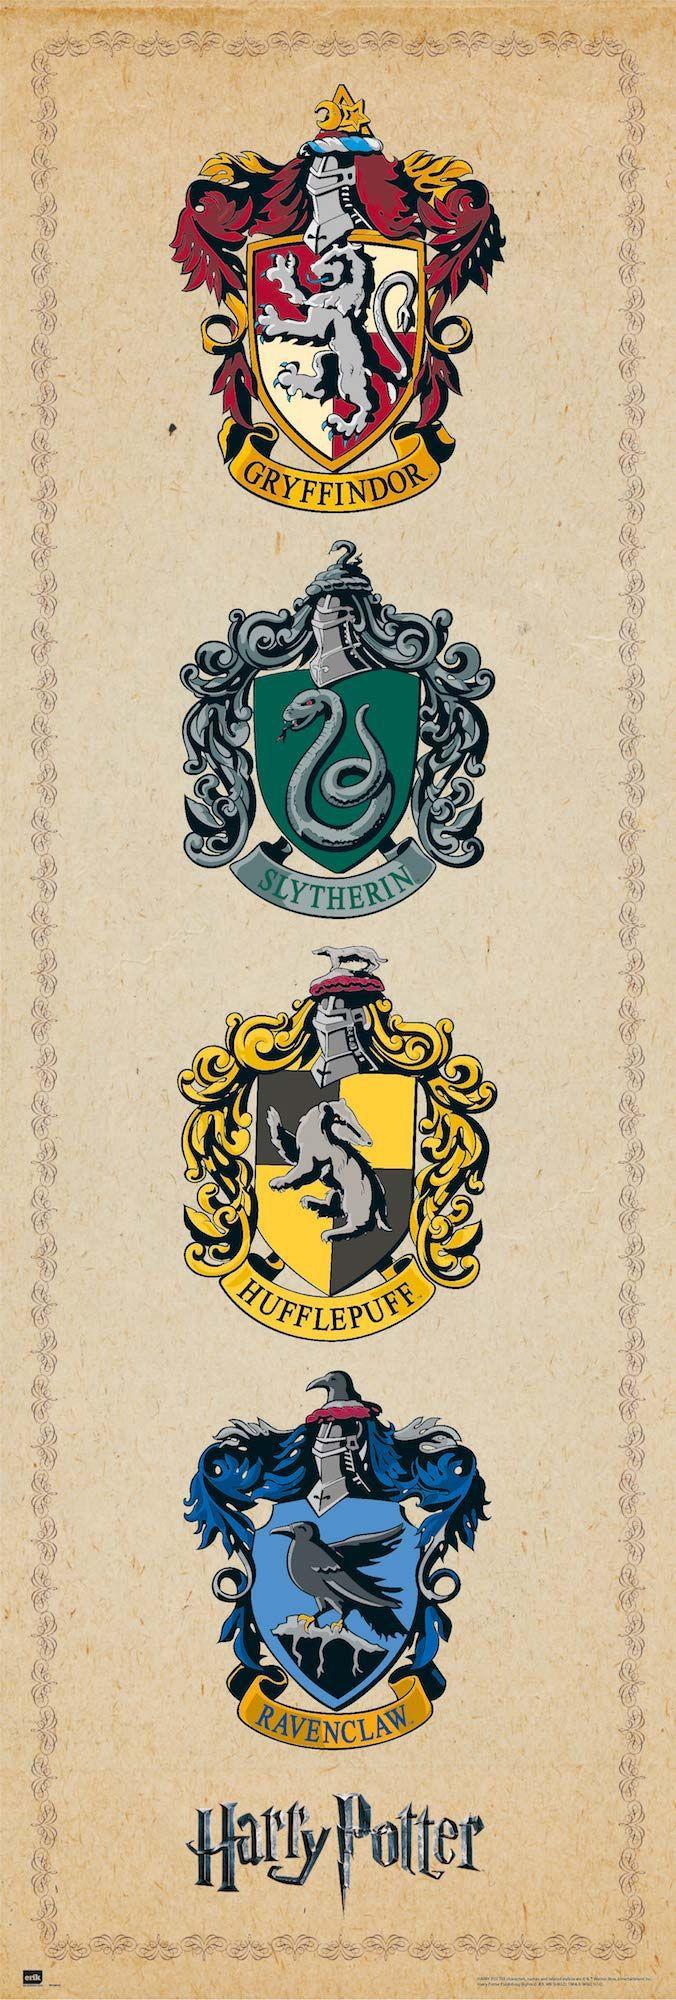 Harry Potter Langbahnposter 4 Hauserwappen Harry Potter Poster Harry Potter Zeichnungen Harry Potter Bildschirmhintergrund